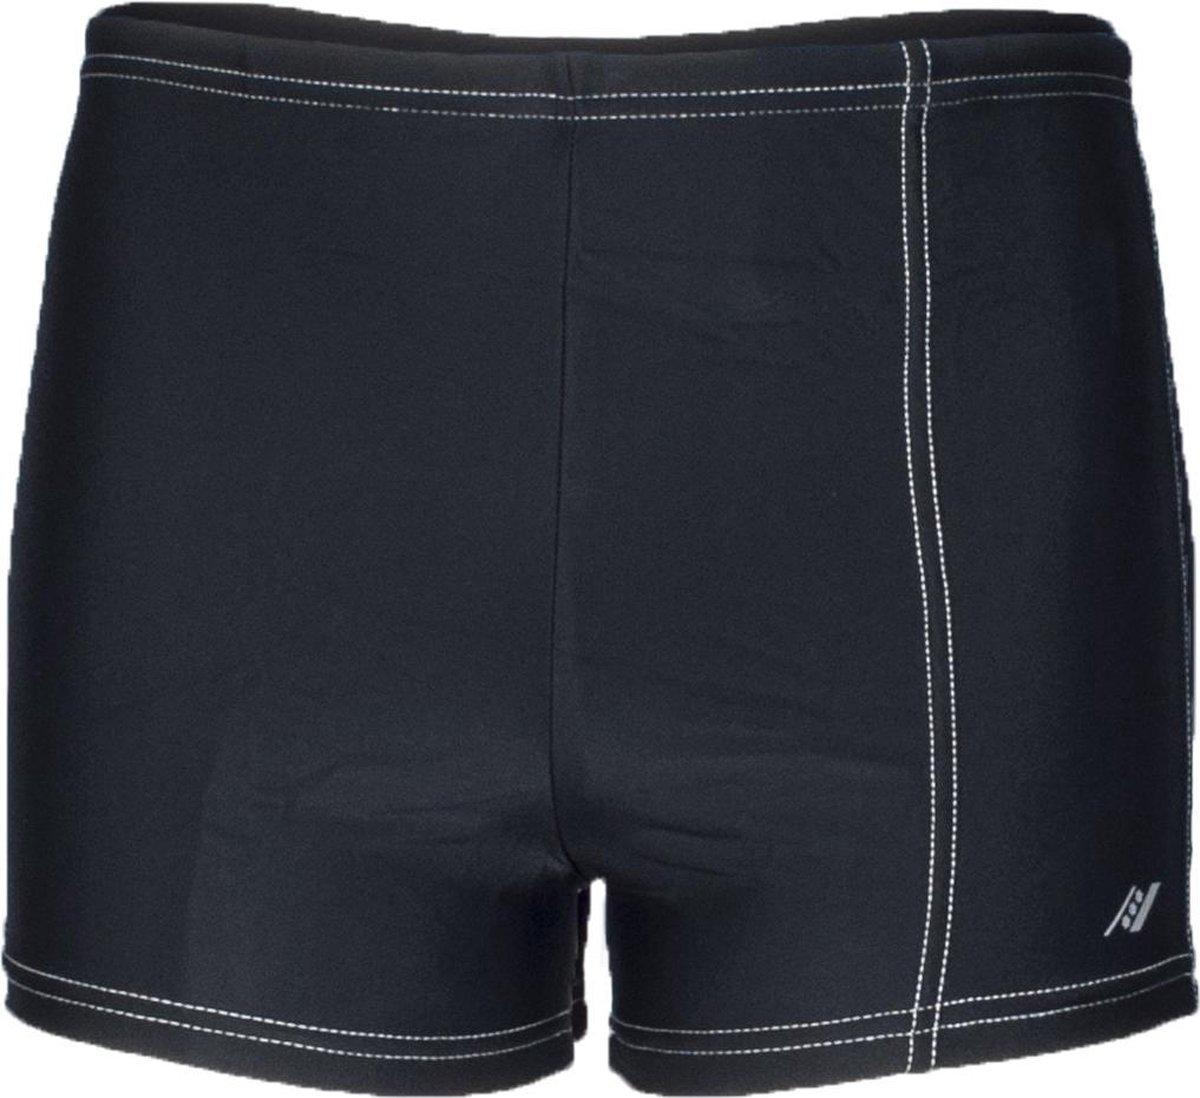 Rucanor Adrian Zwemboxer - Zwemslips  - zwart - XL